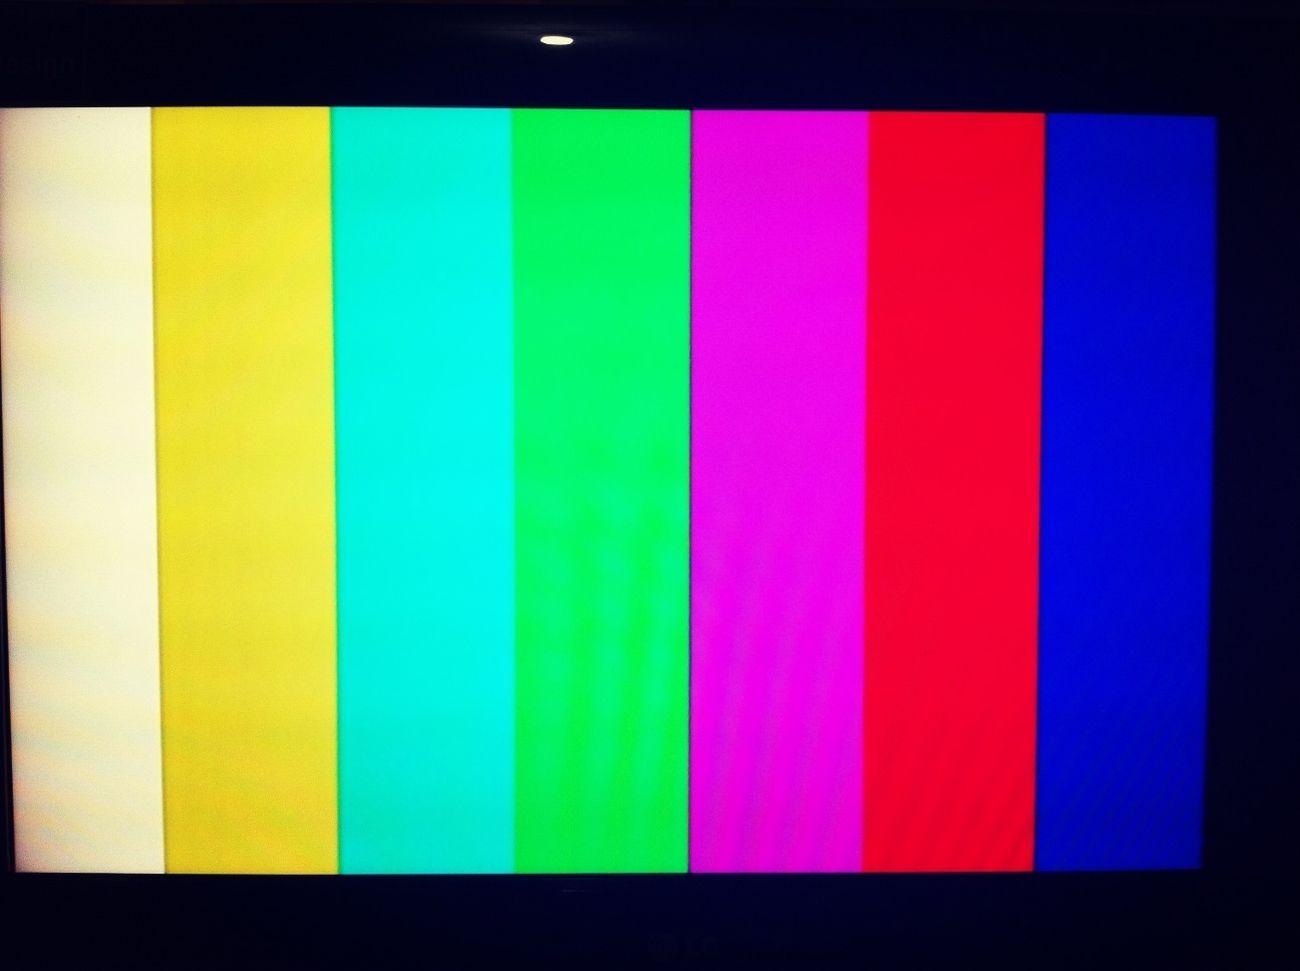 Rainbow TV.